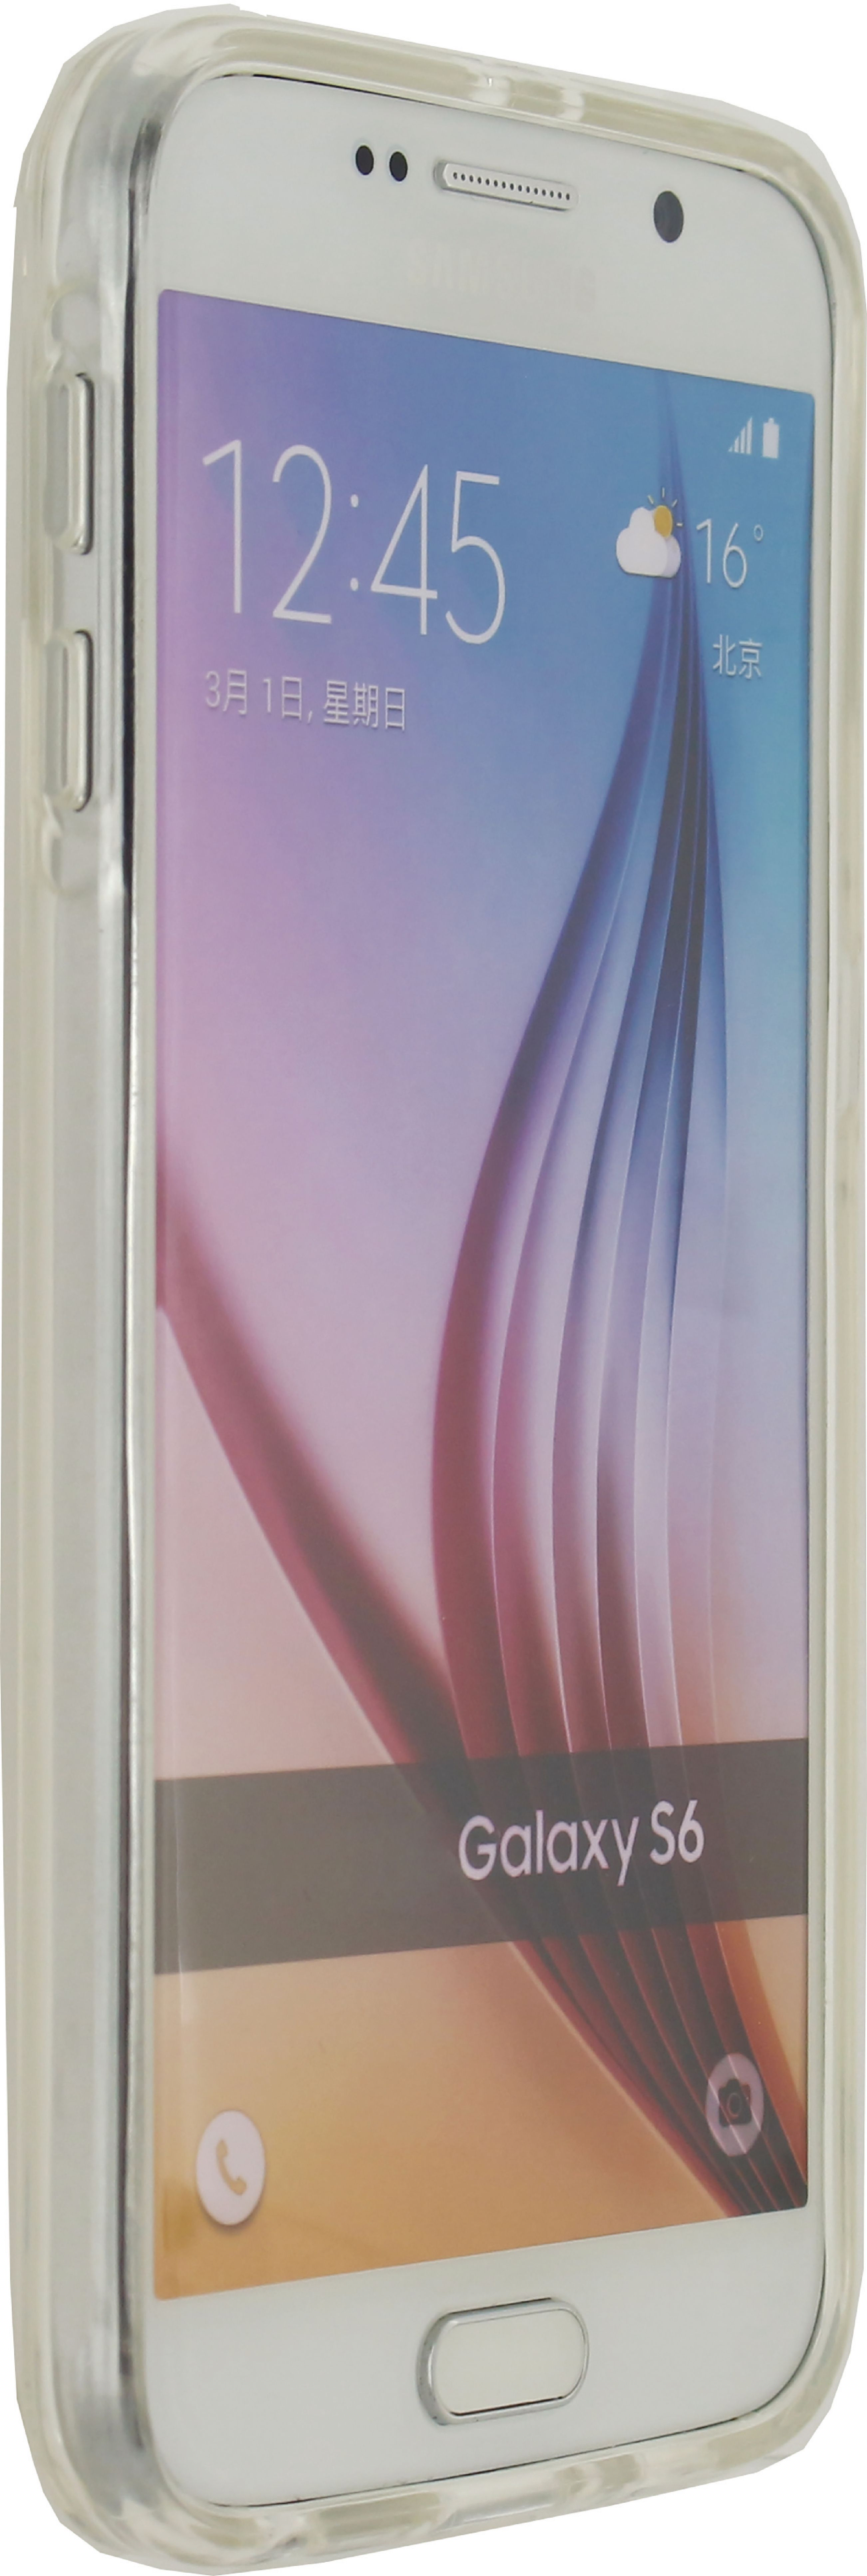 Image of   Telefon Transparent Beskyttelsesetui Samsung Galaxy S6 Gennemsigtig